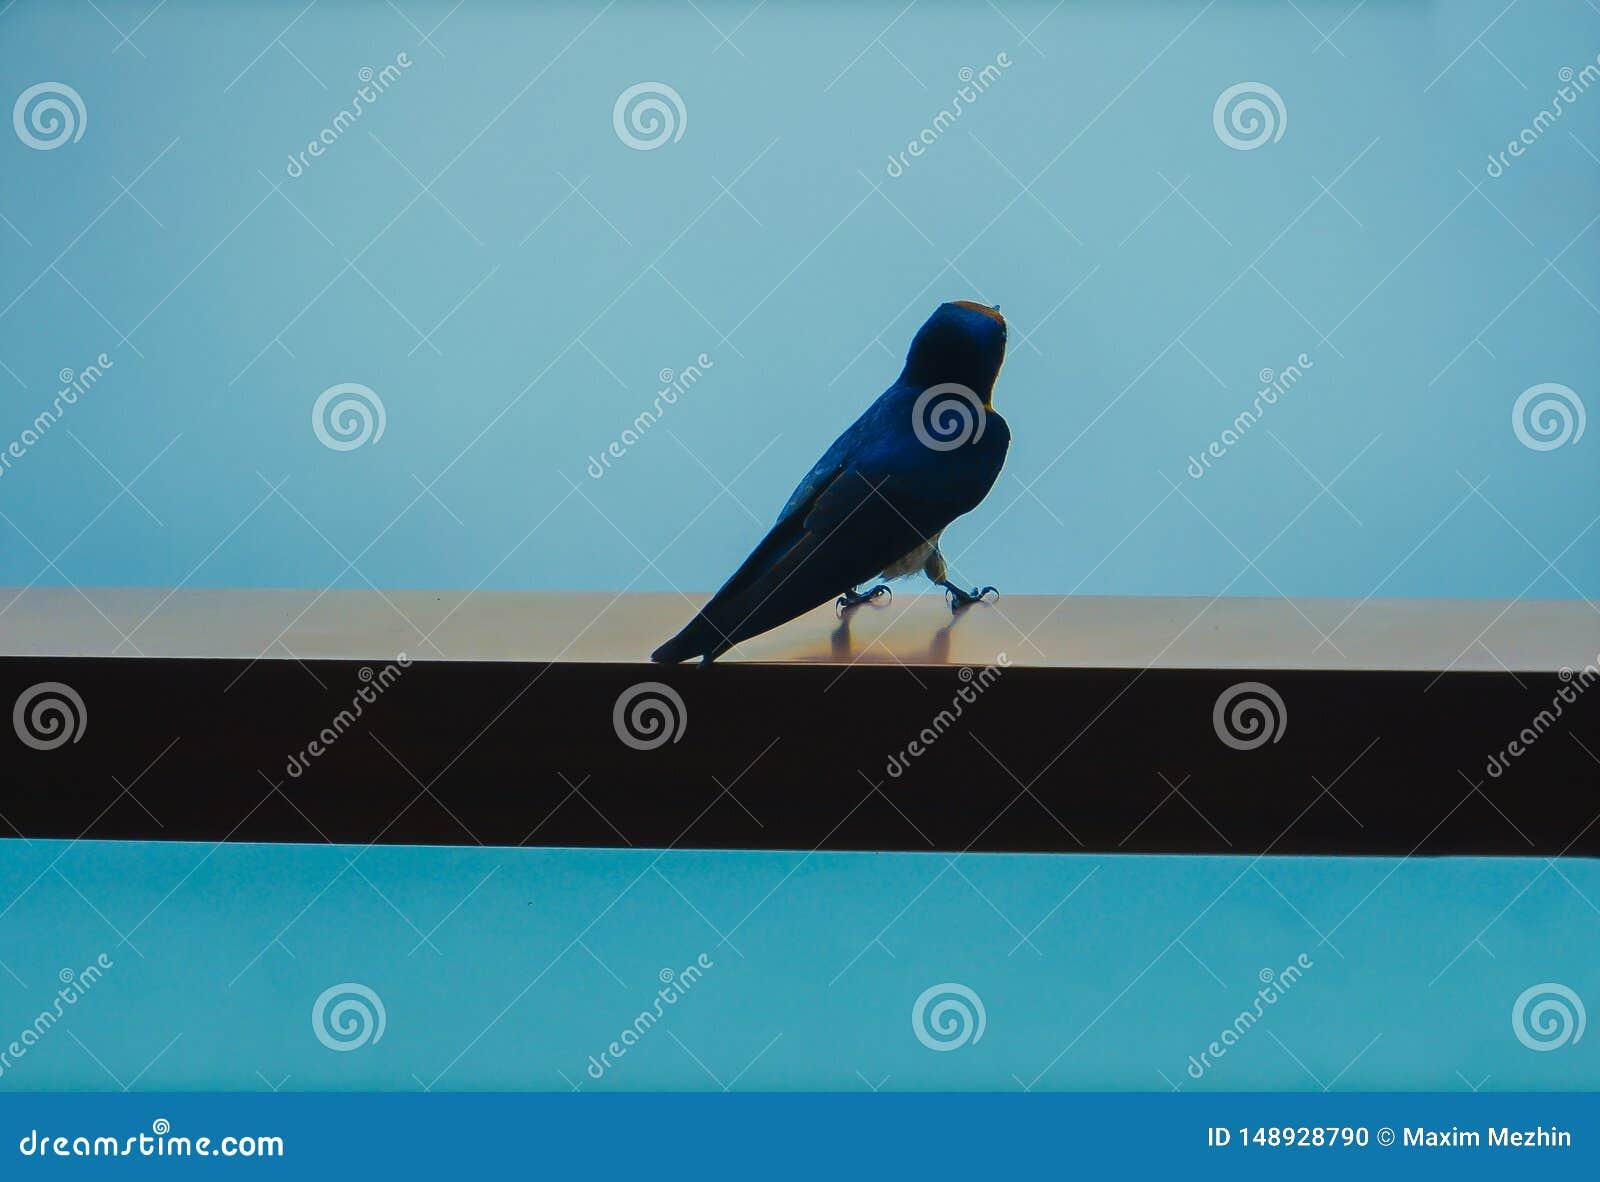 Blue bird sitting on the balcony